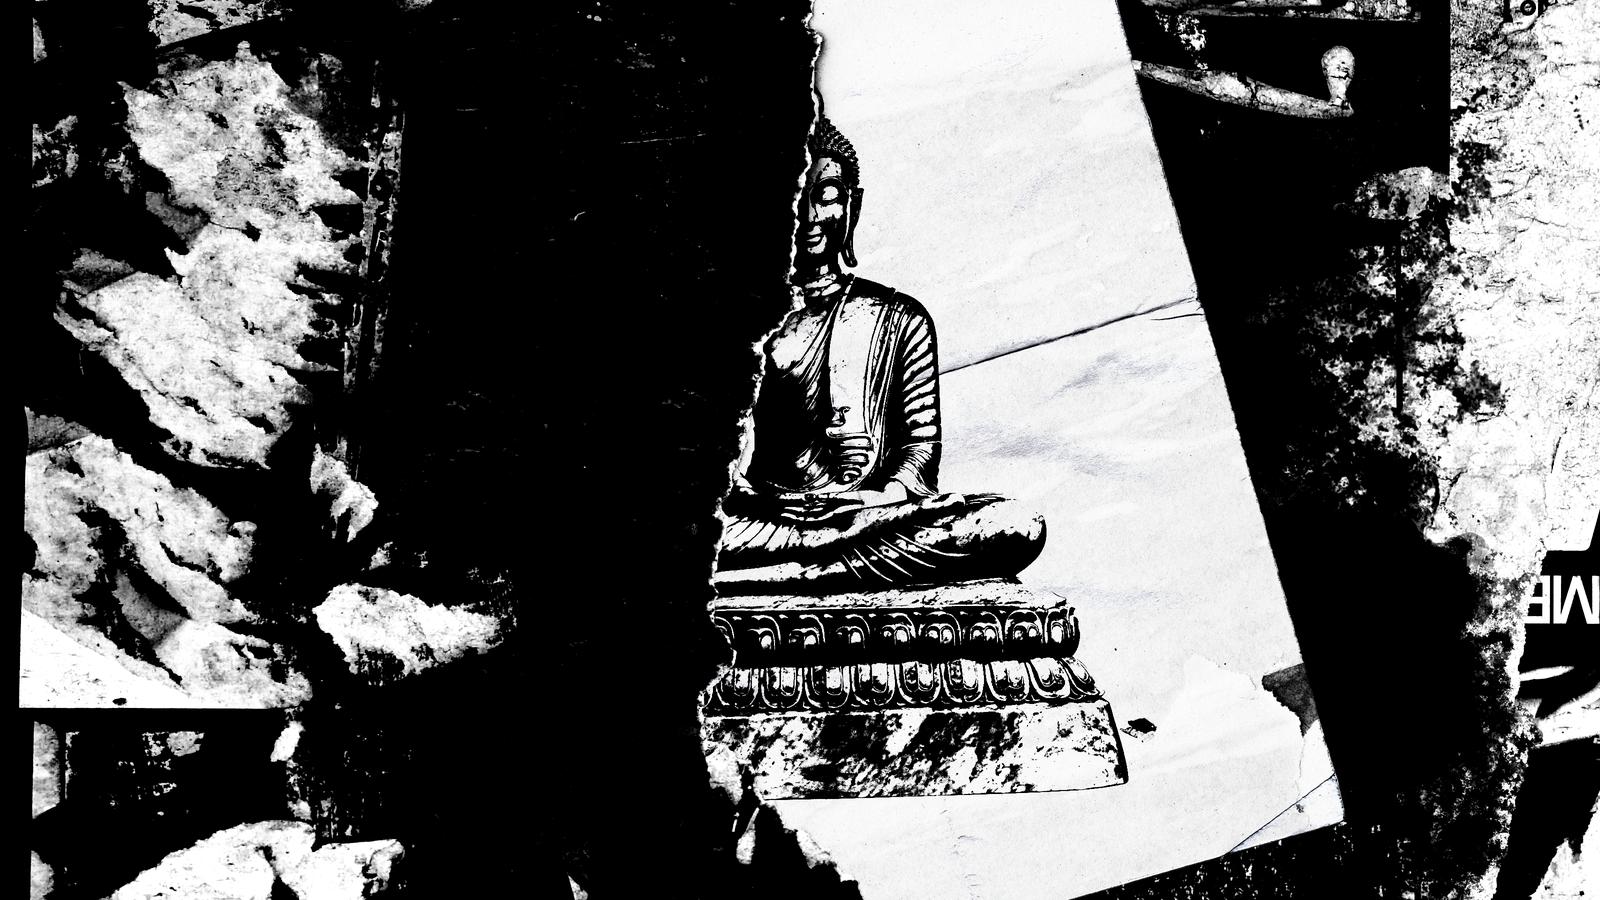 A Murky Scandal Involving a Powerful Punk Rock Dharma Teacher Is Dividing a Major Buddhist Community